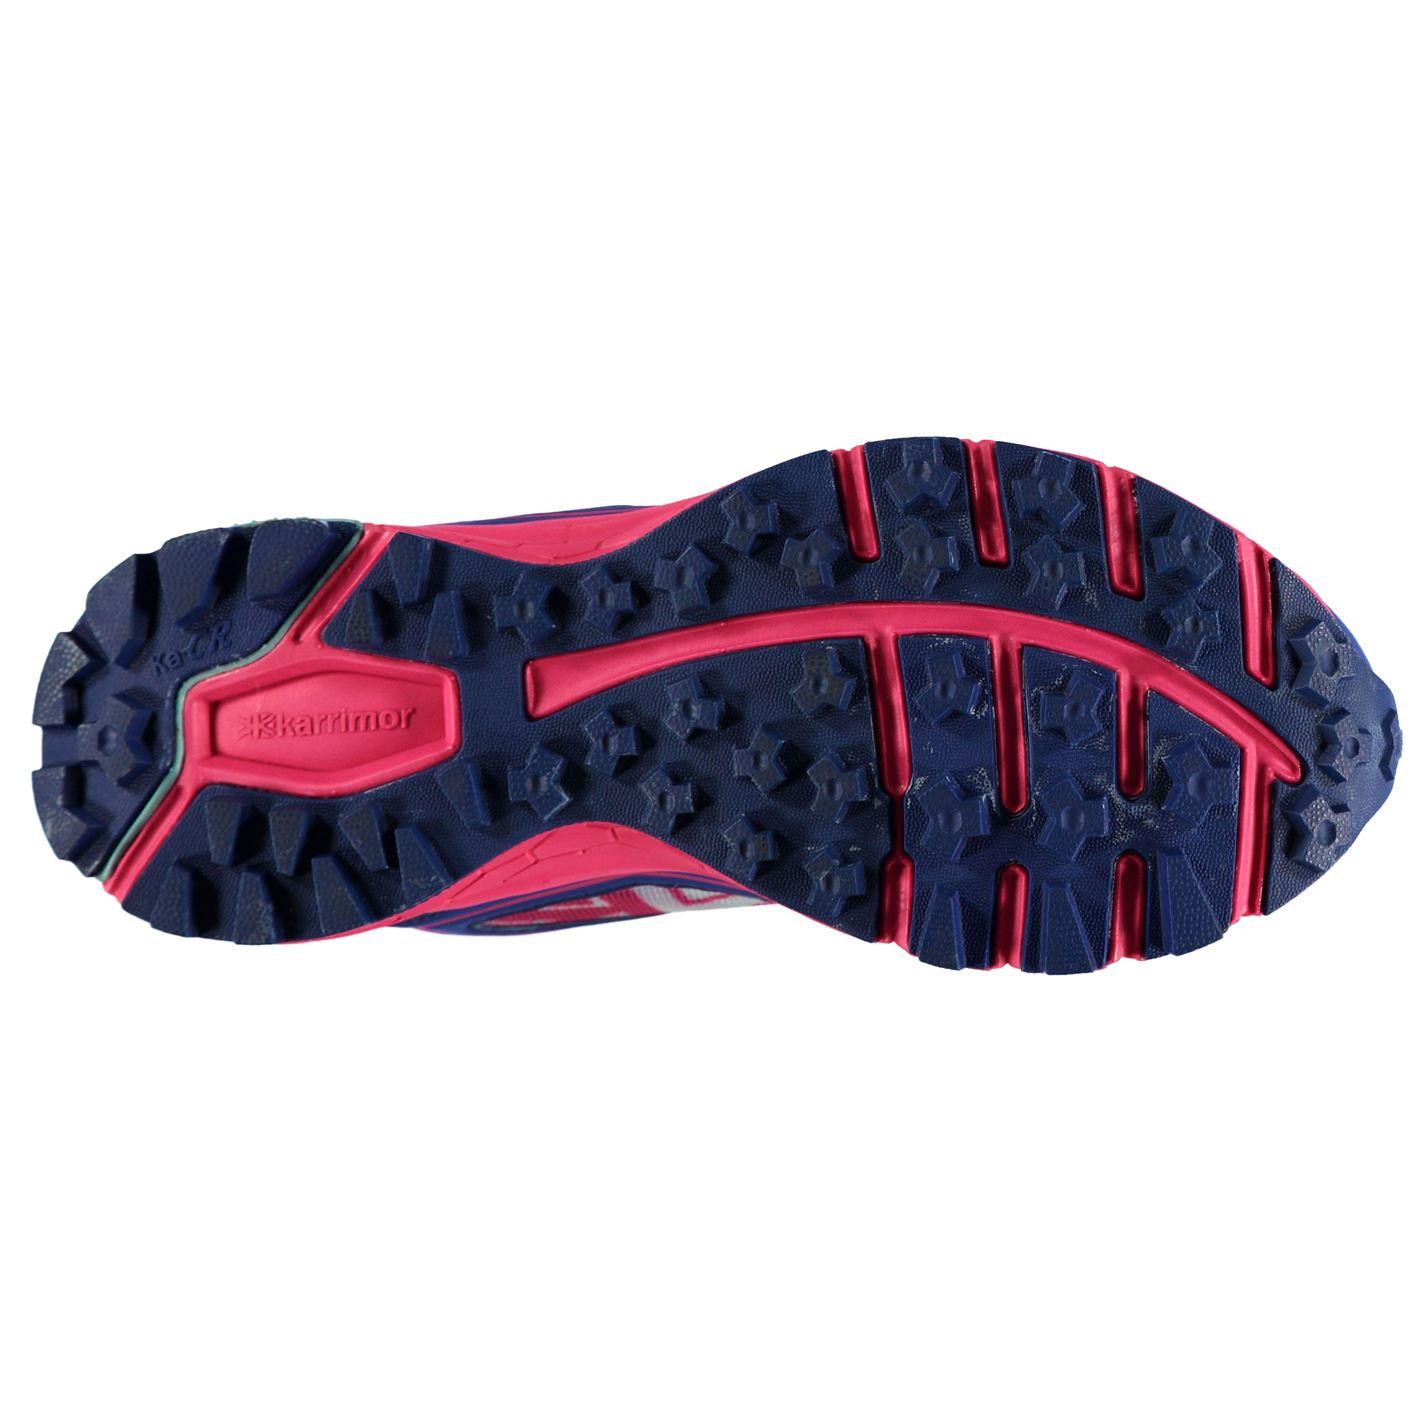 bf459183da5 Karrimor Kids Tempo 4 Junior Kids Trail Running Shoes Childrens